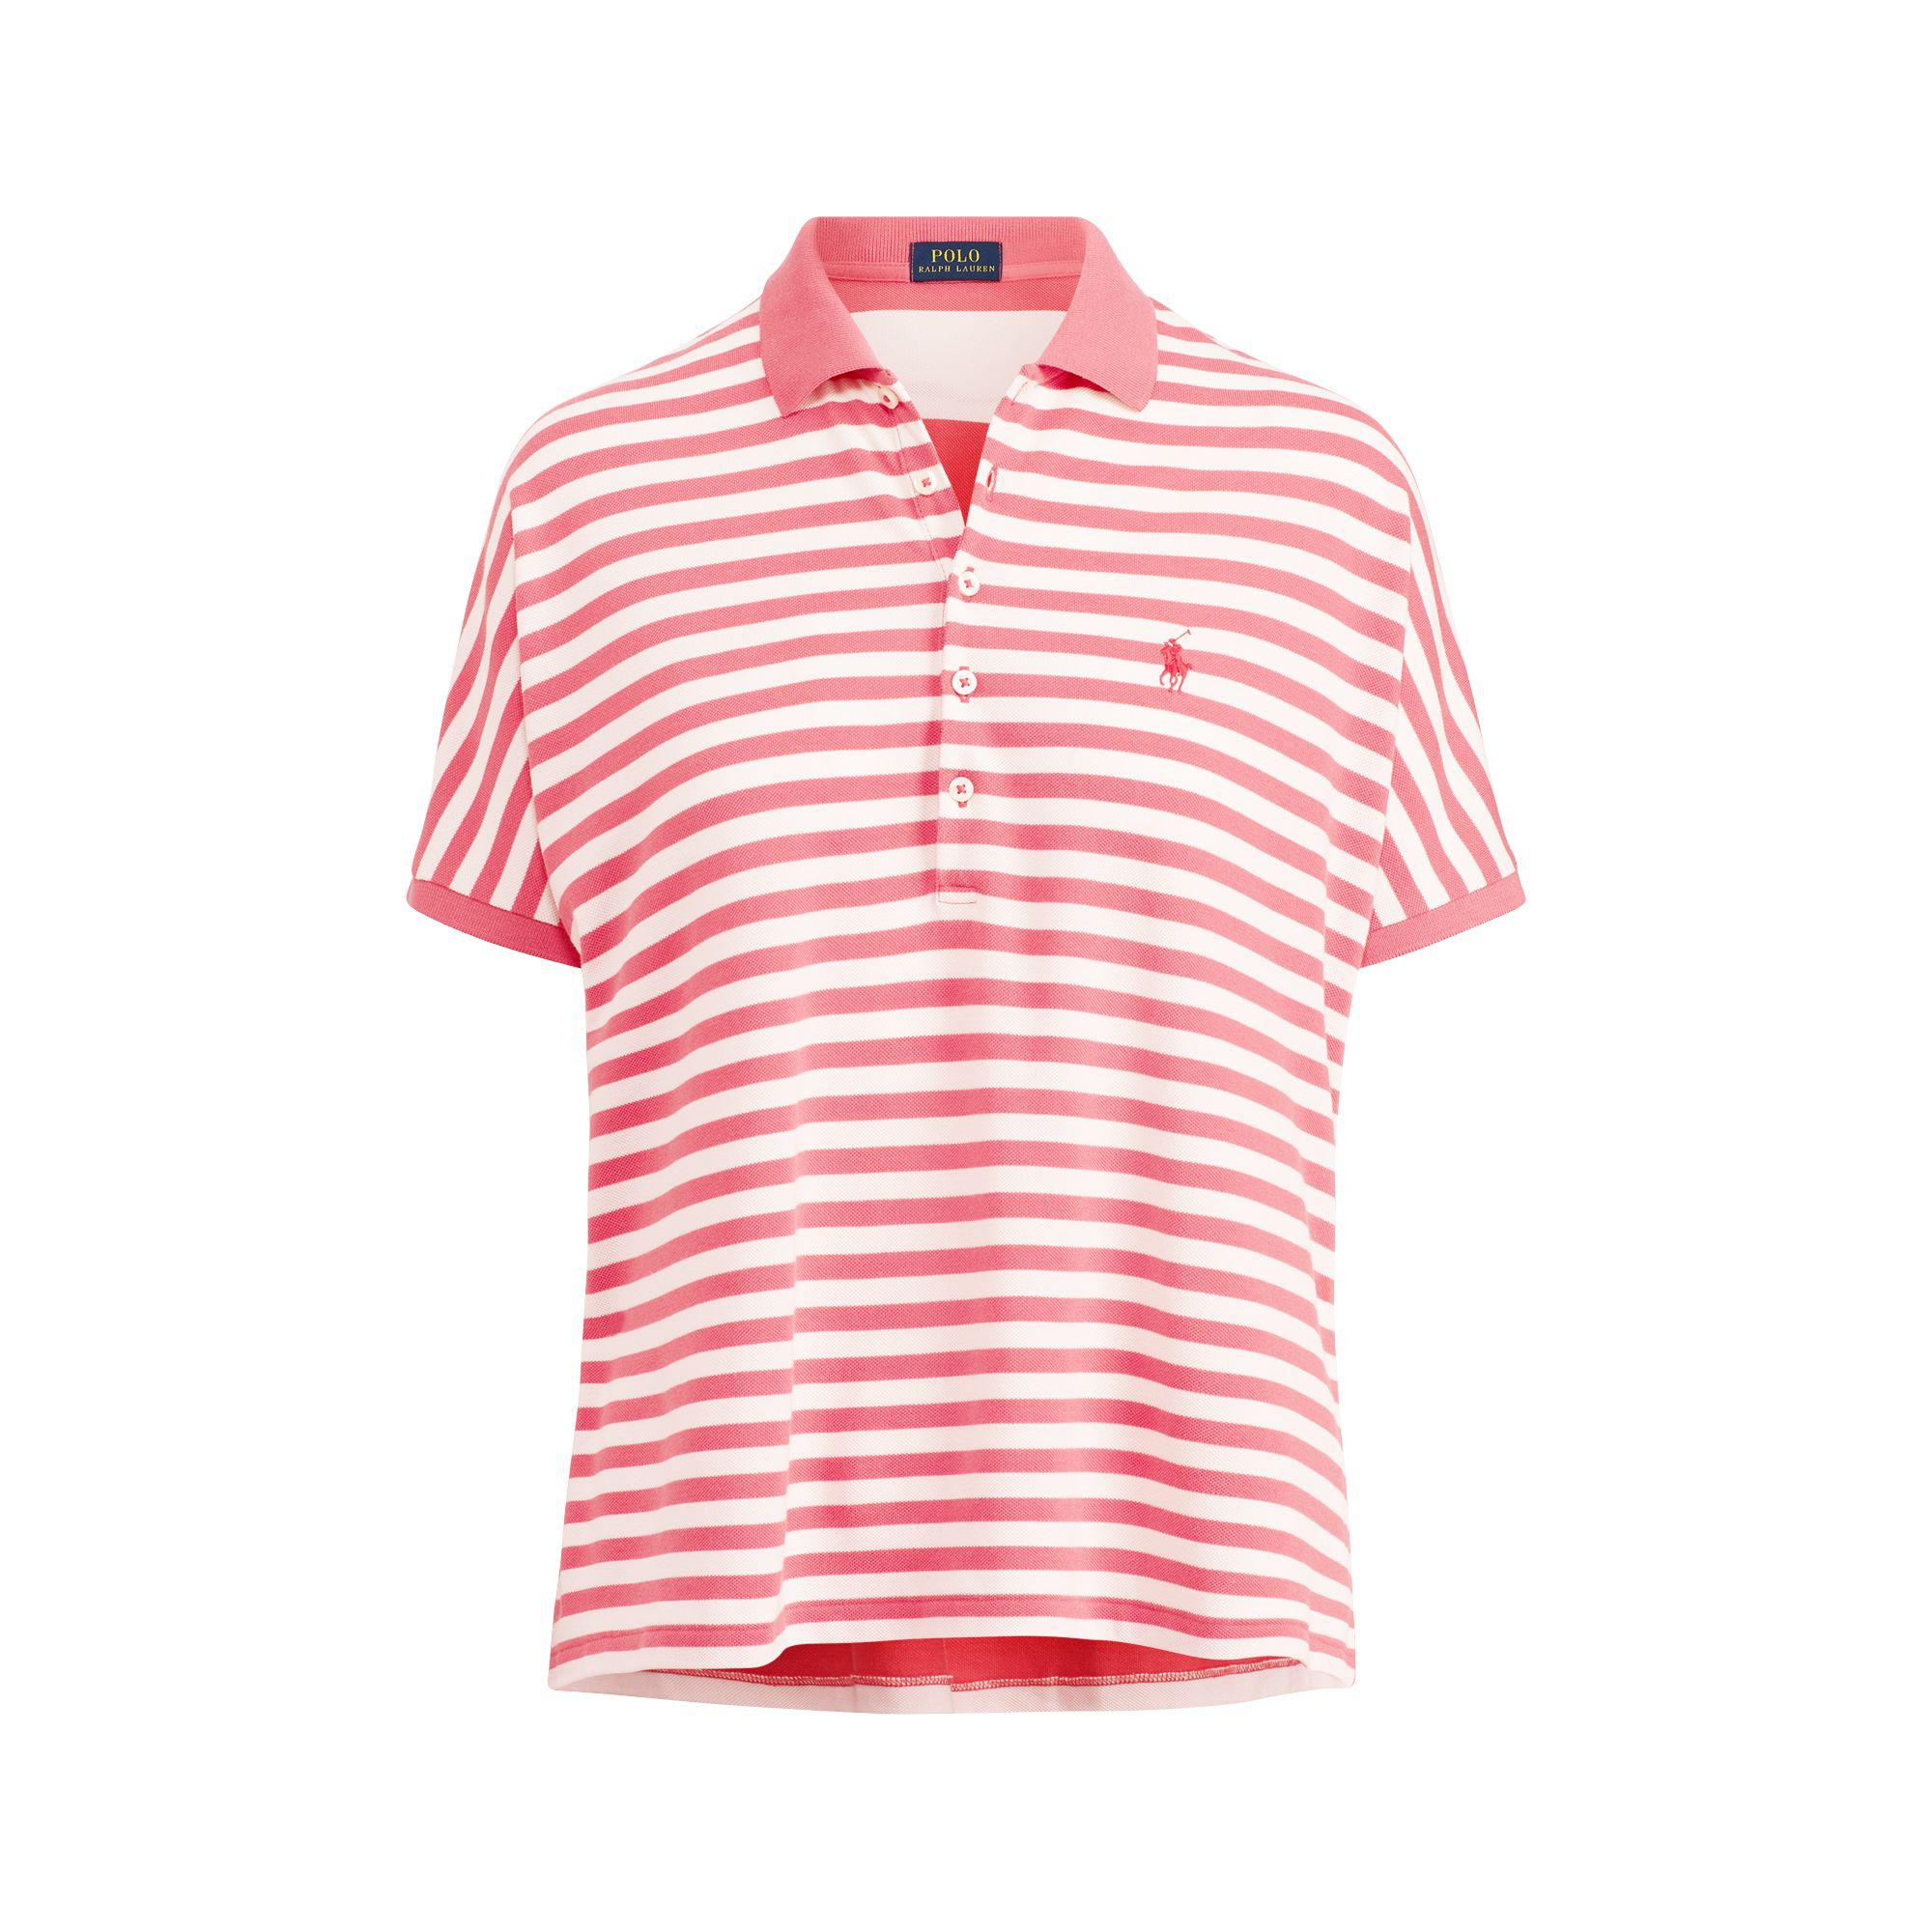 Poncho Lauren Ralph Striped Shirt Polo Mesh Red zMpSUV